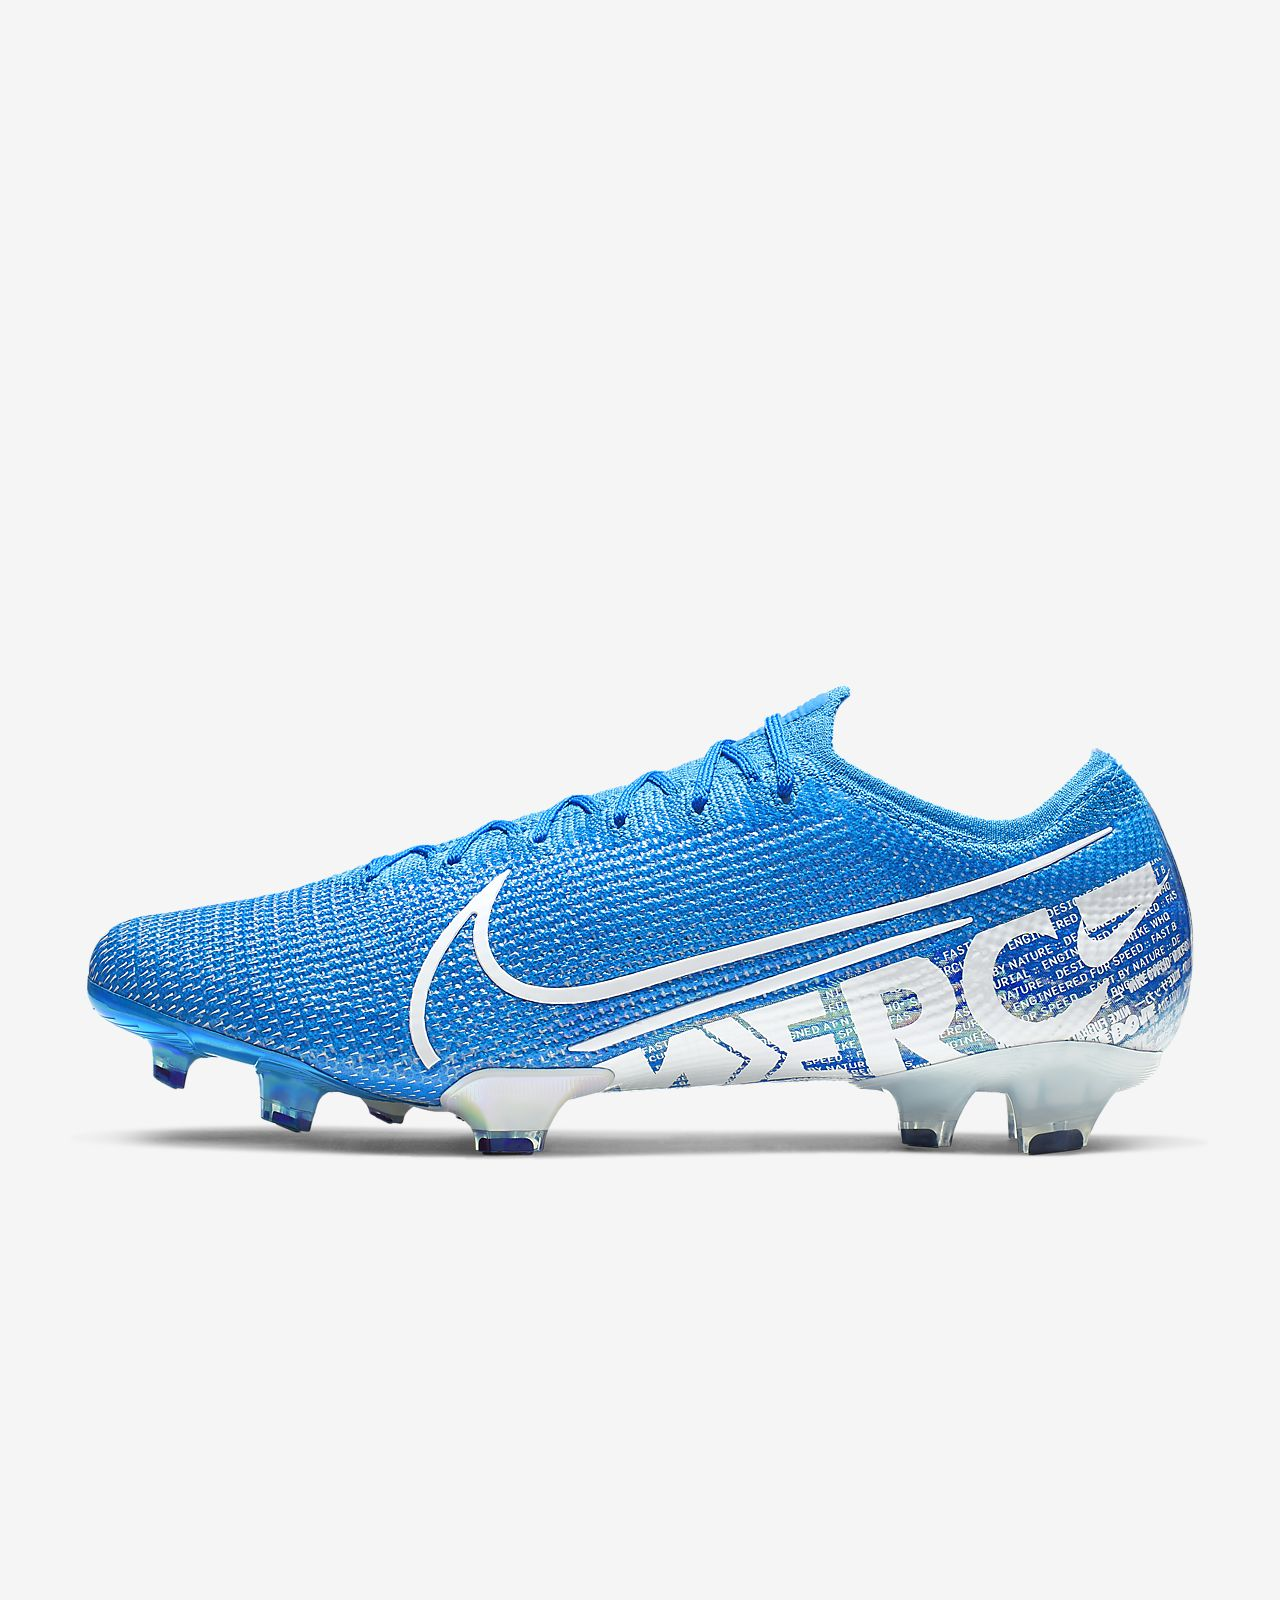 Korki piłkarskie na twardą murawę Nike Mercurial Vapor 13 Elite FG